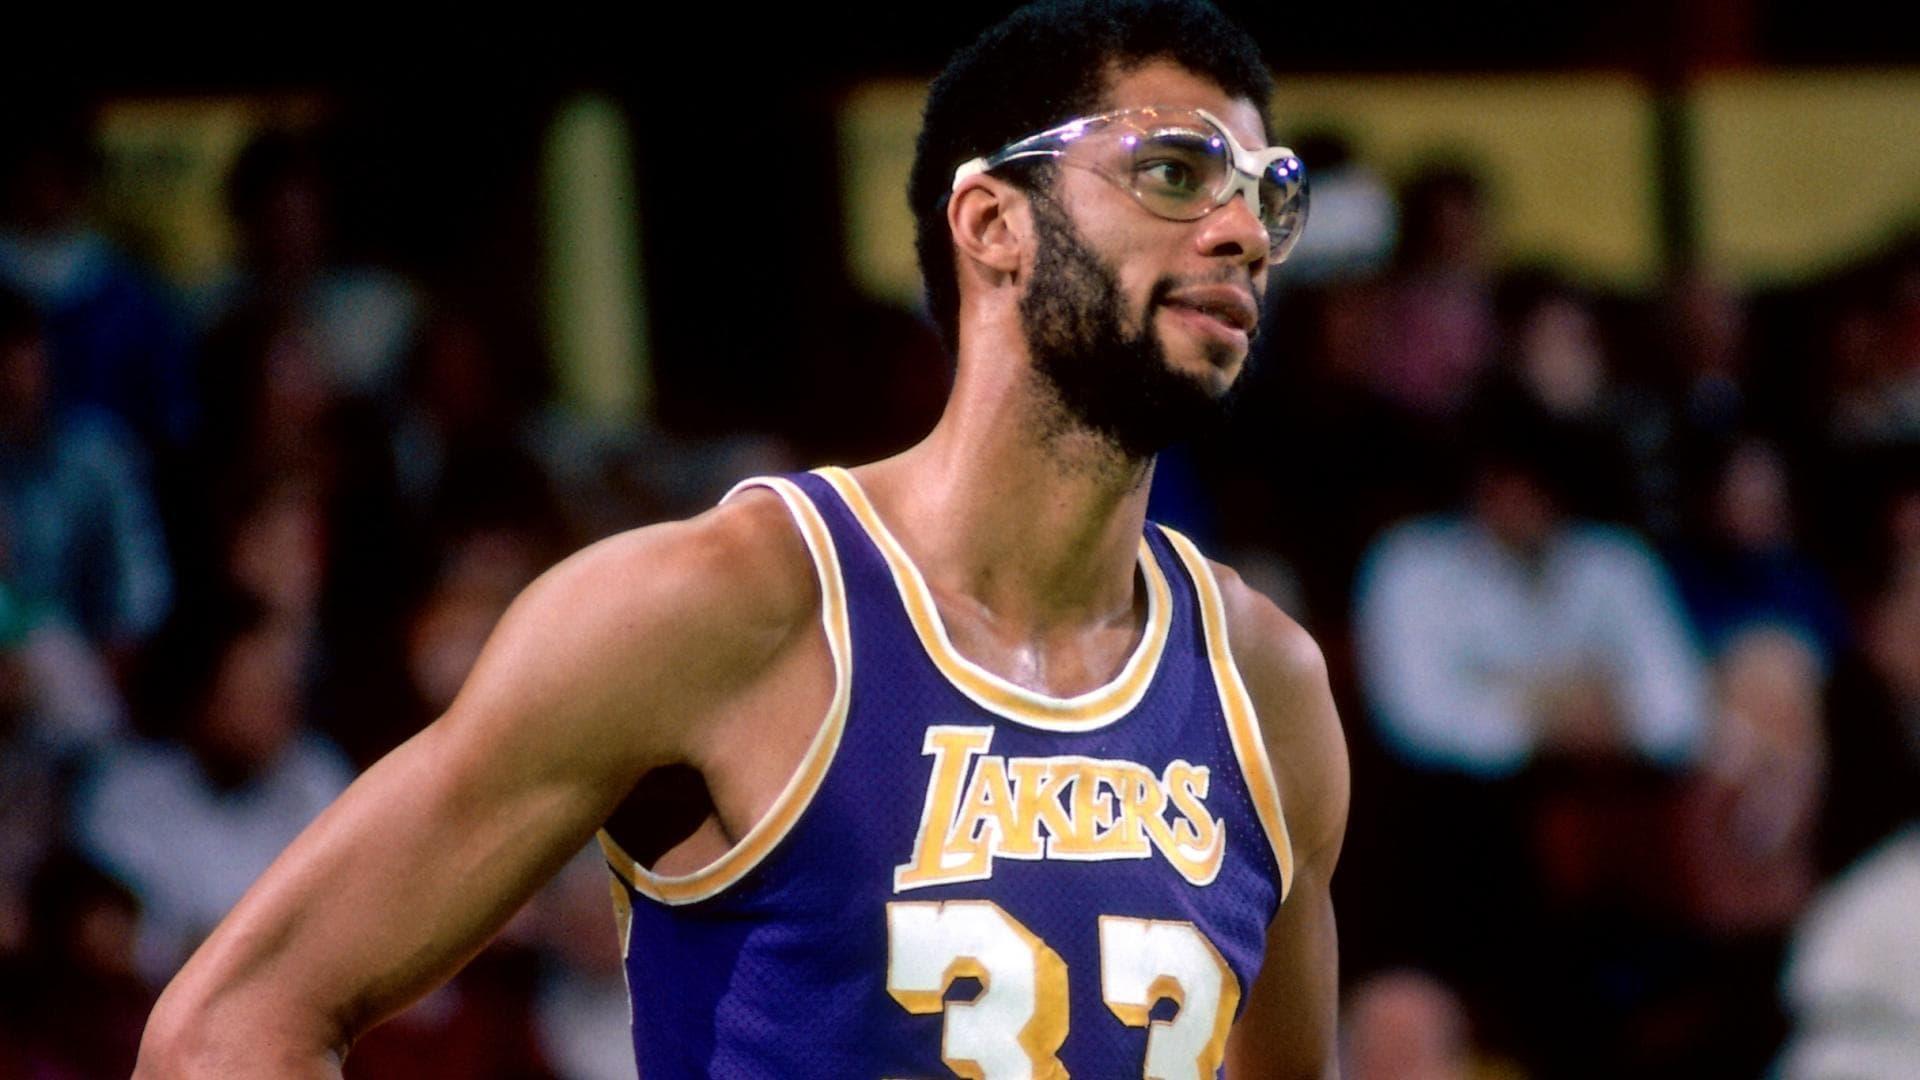 Legends profile: Kareem Abdul-Jabbar